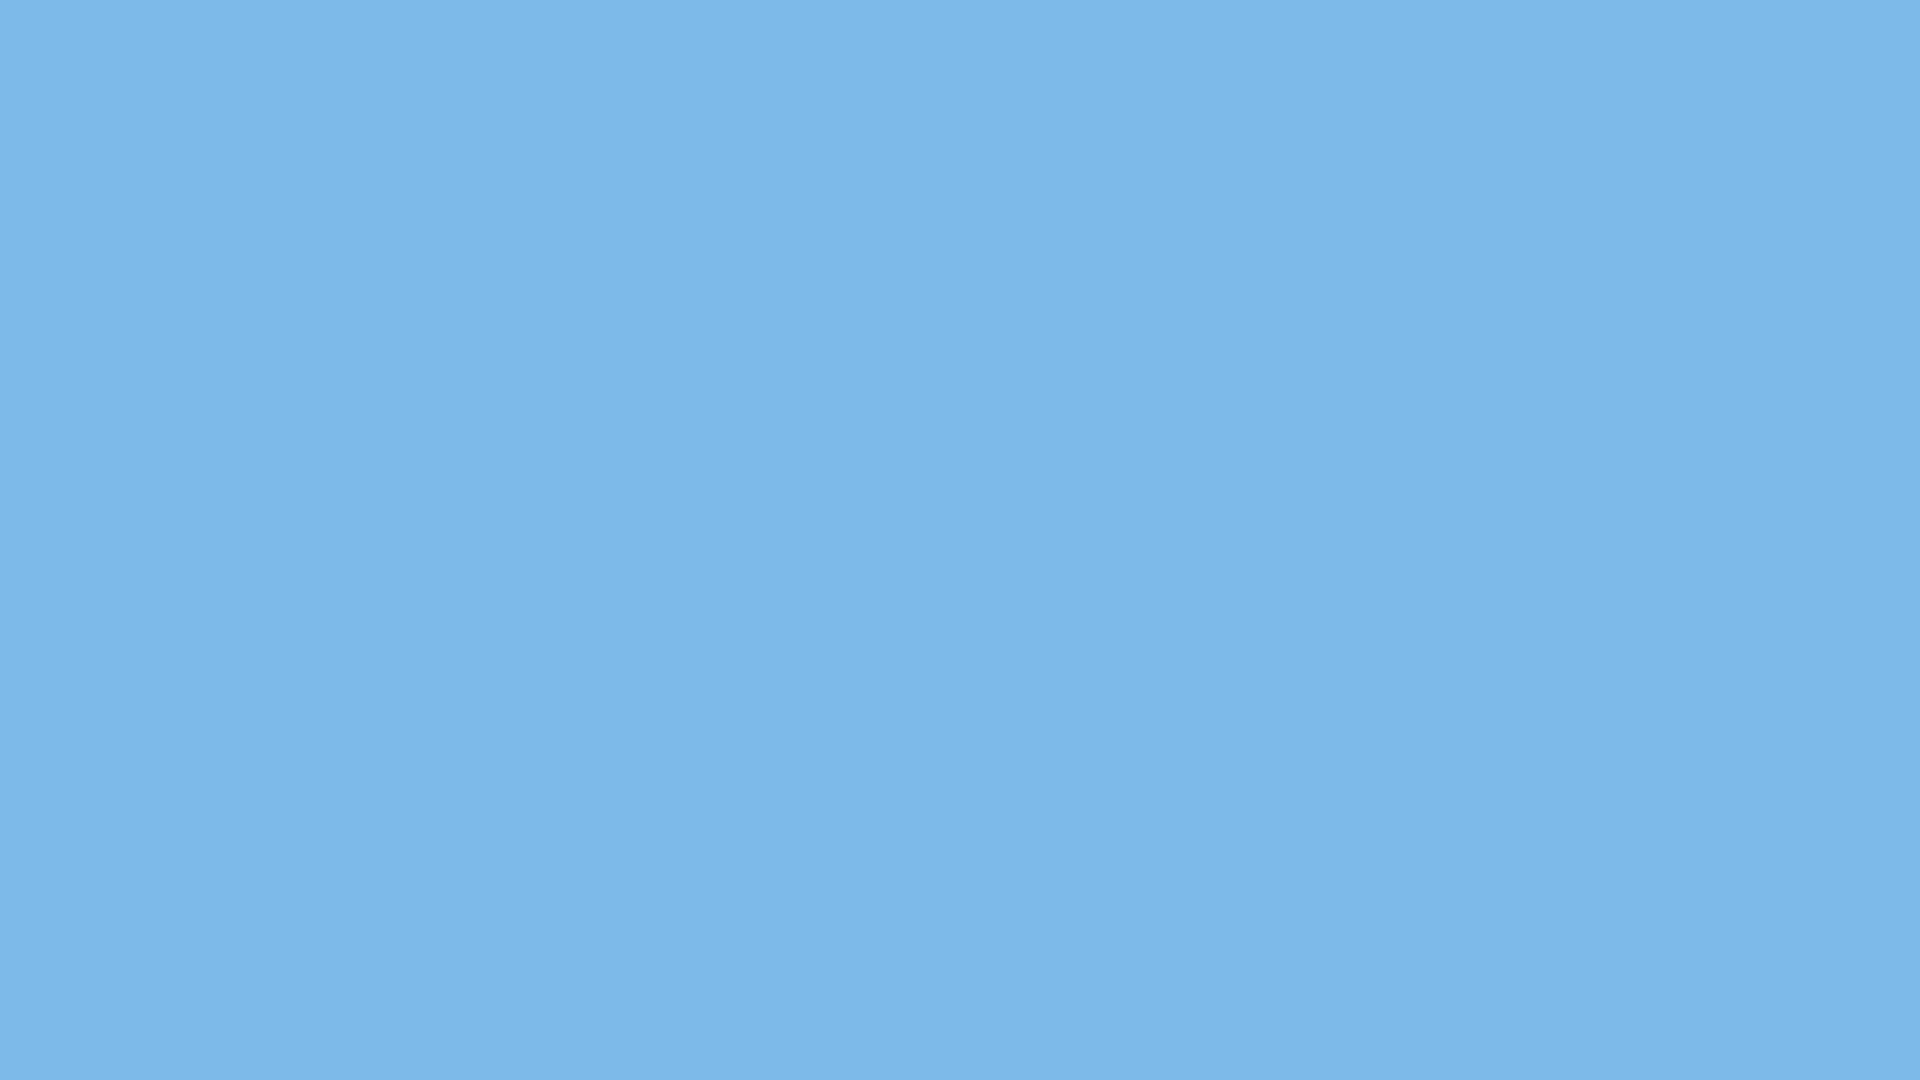 1920x1080 Aero Solid Color Background